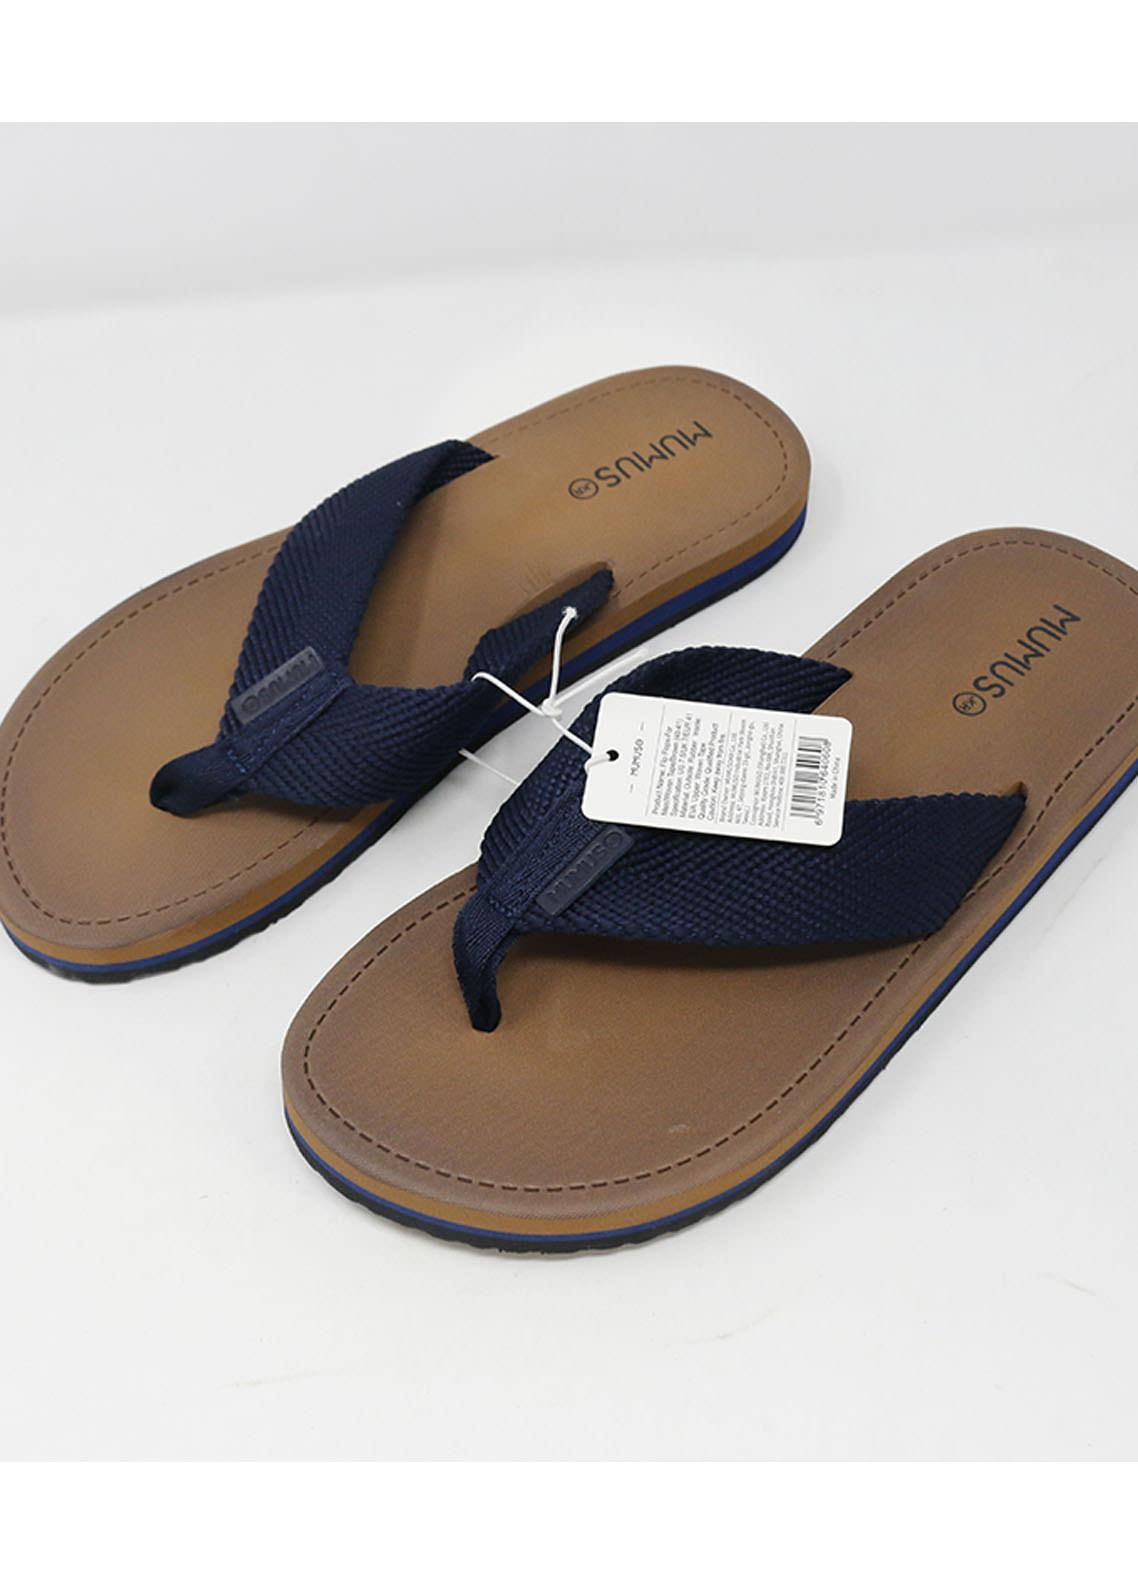 Mumuso Casual Style  Flat Flip Flop 03 M-BROWN